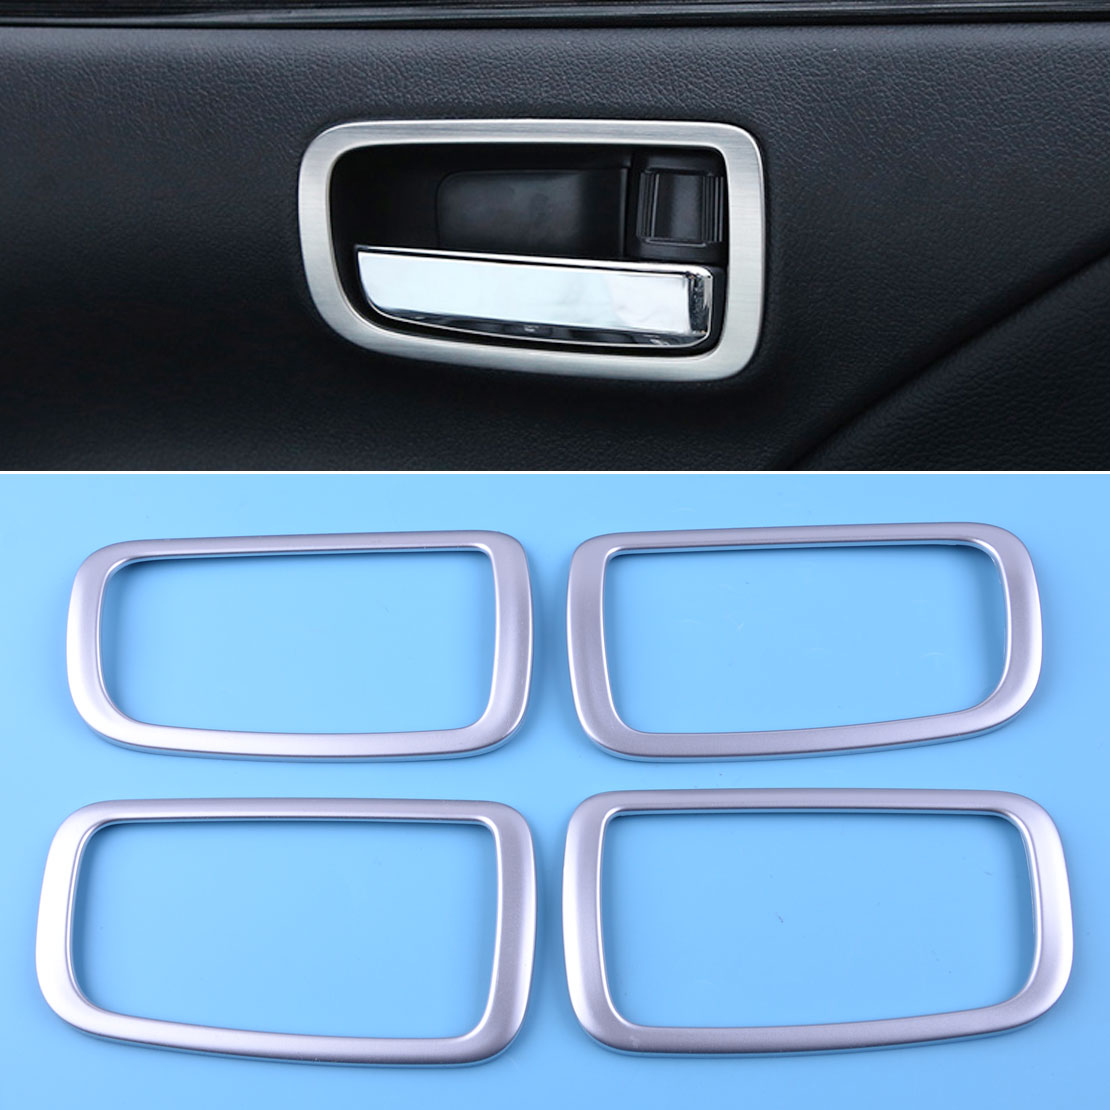 Chrome Interior Switch Molding Trim Cover for 09-13 Tucson ix35